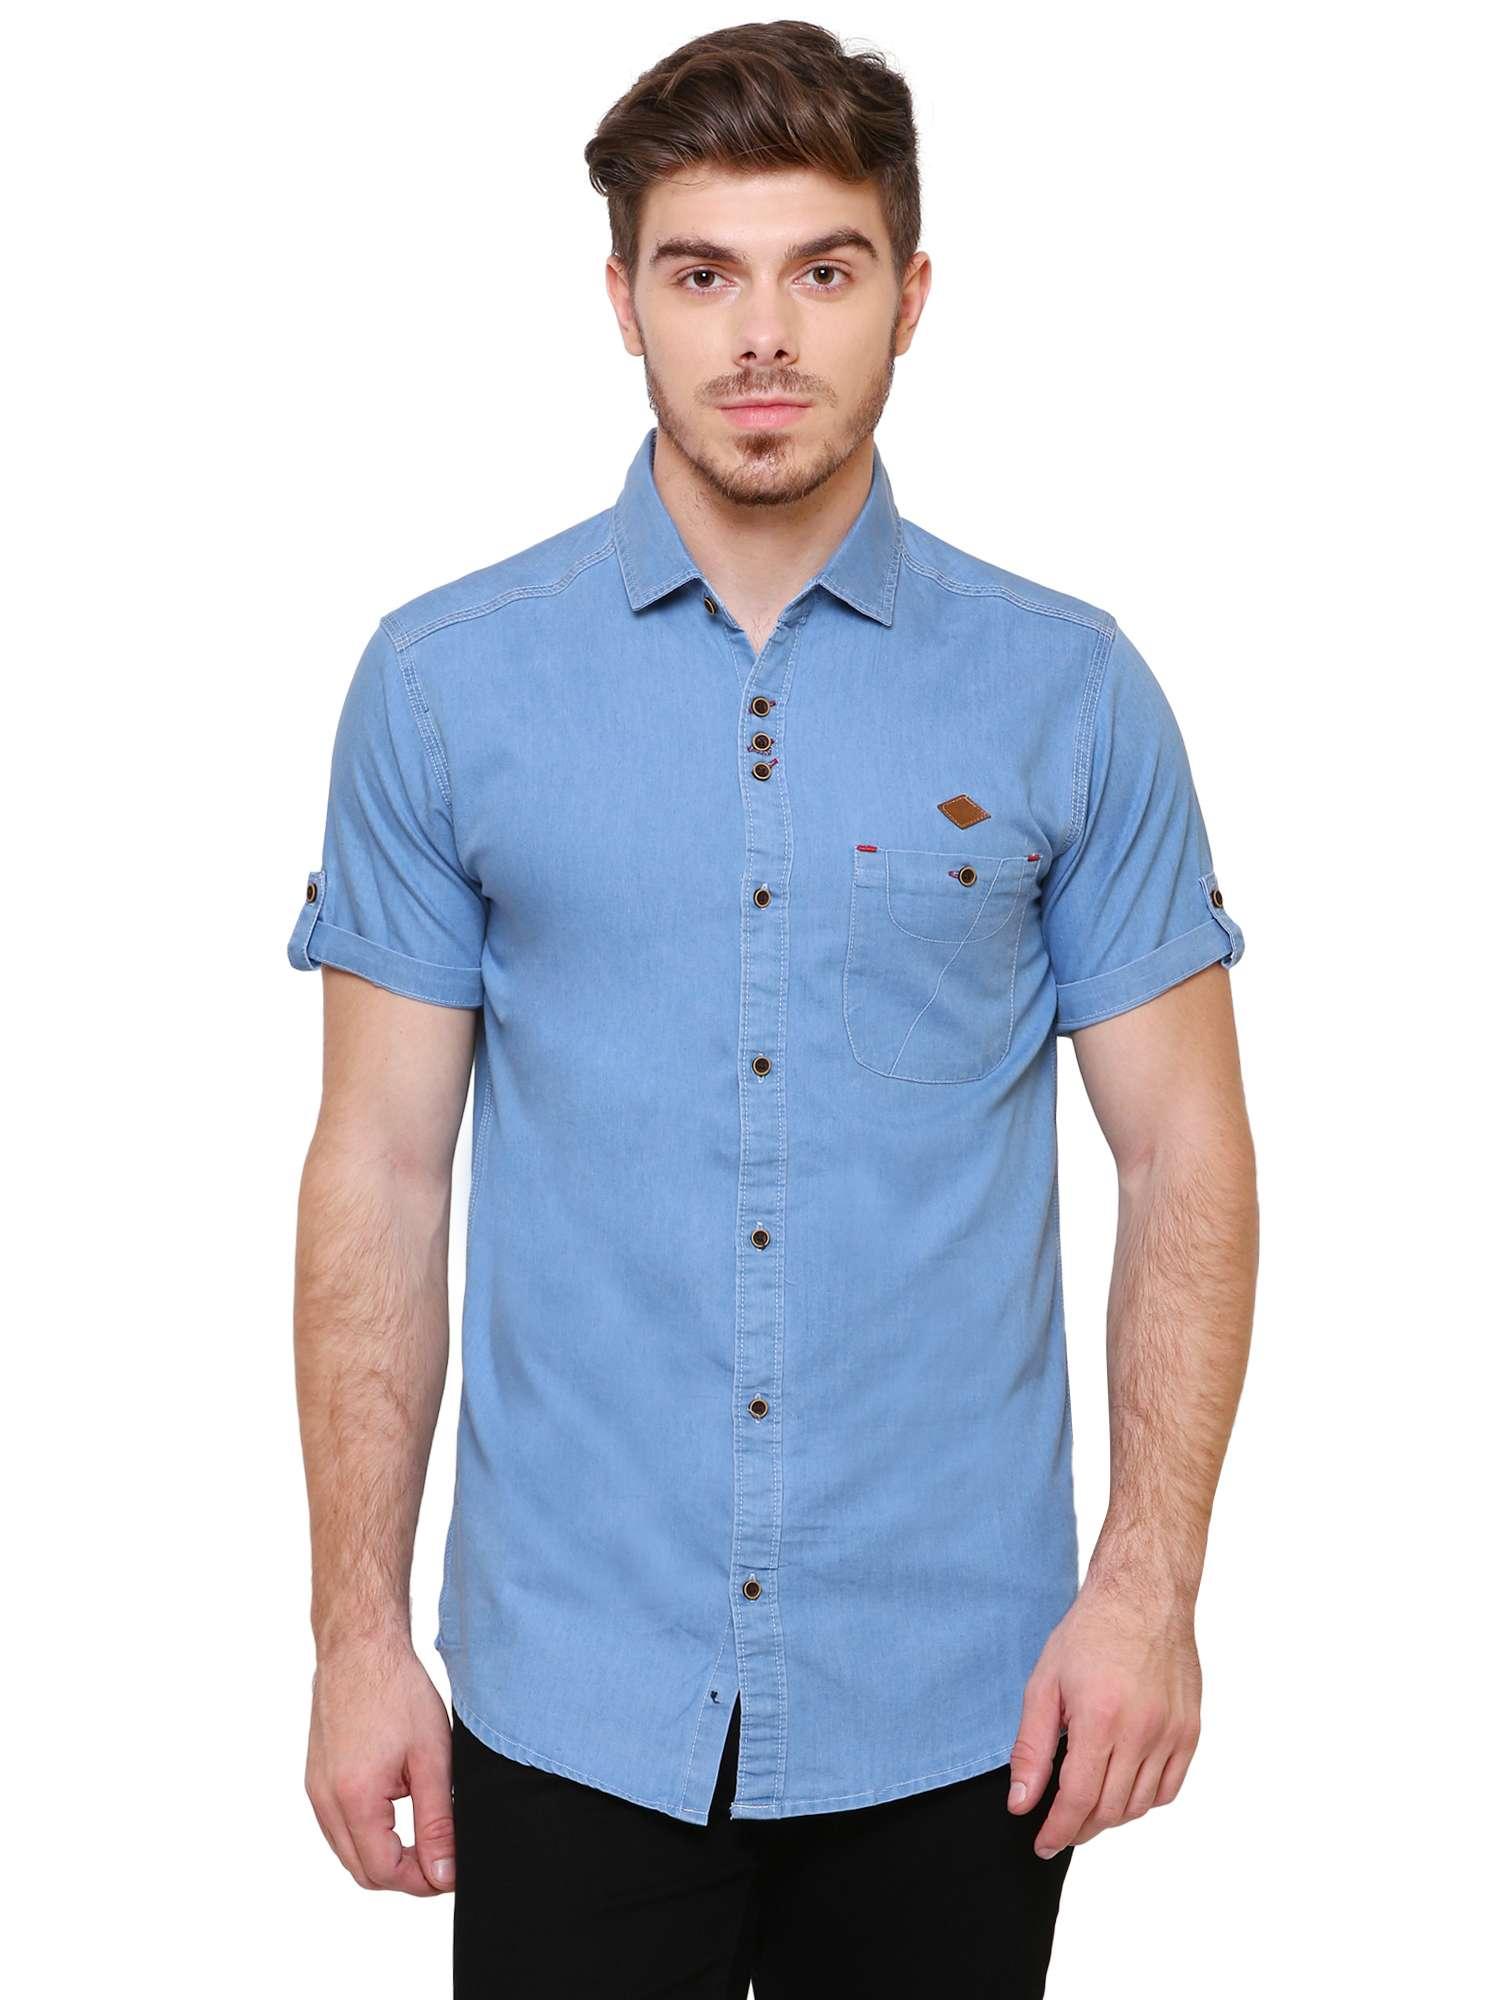 Kuons Avenue Denim Cotton Half Sleeve Casual Shirt for Men